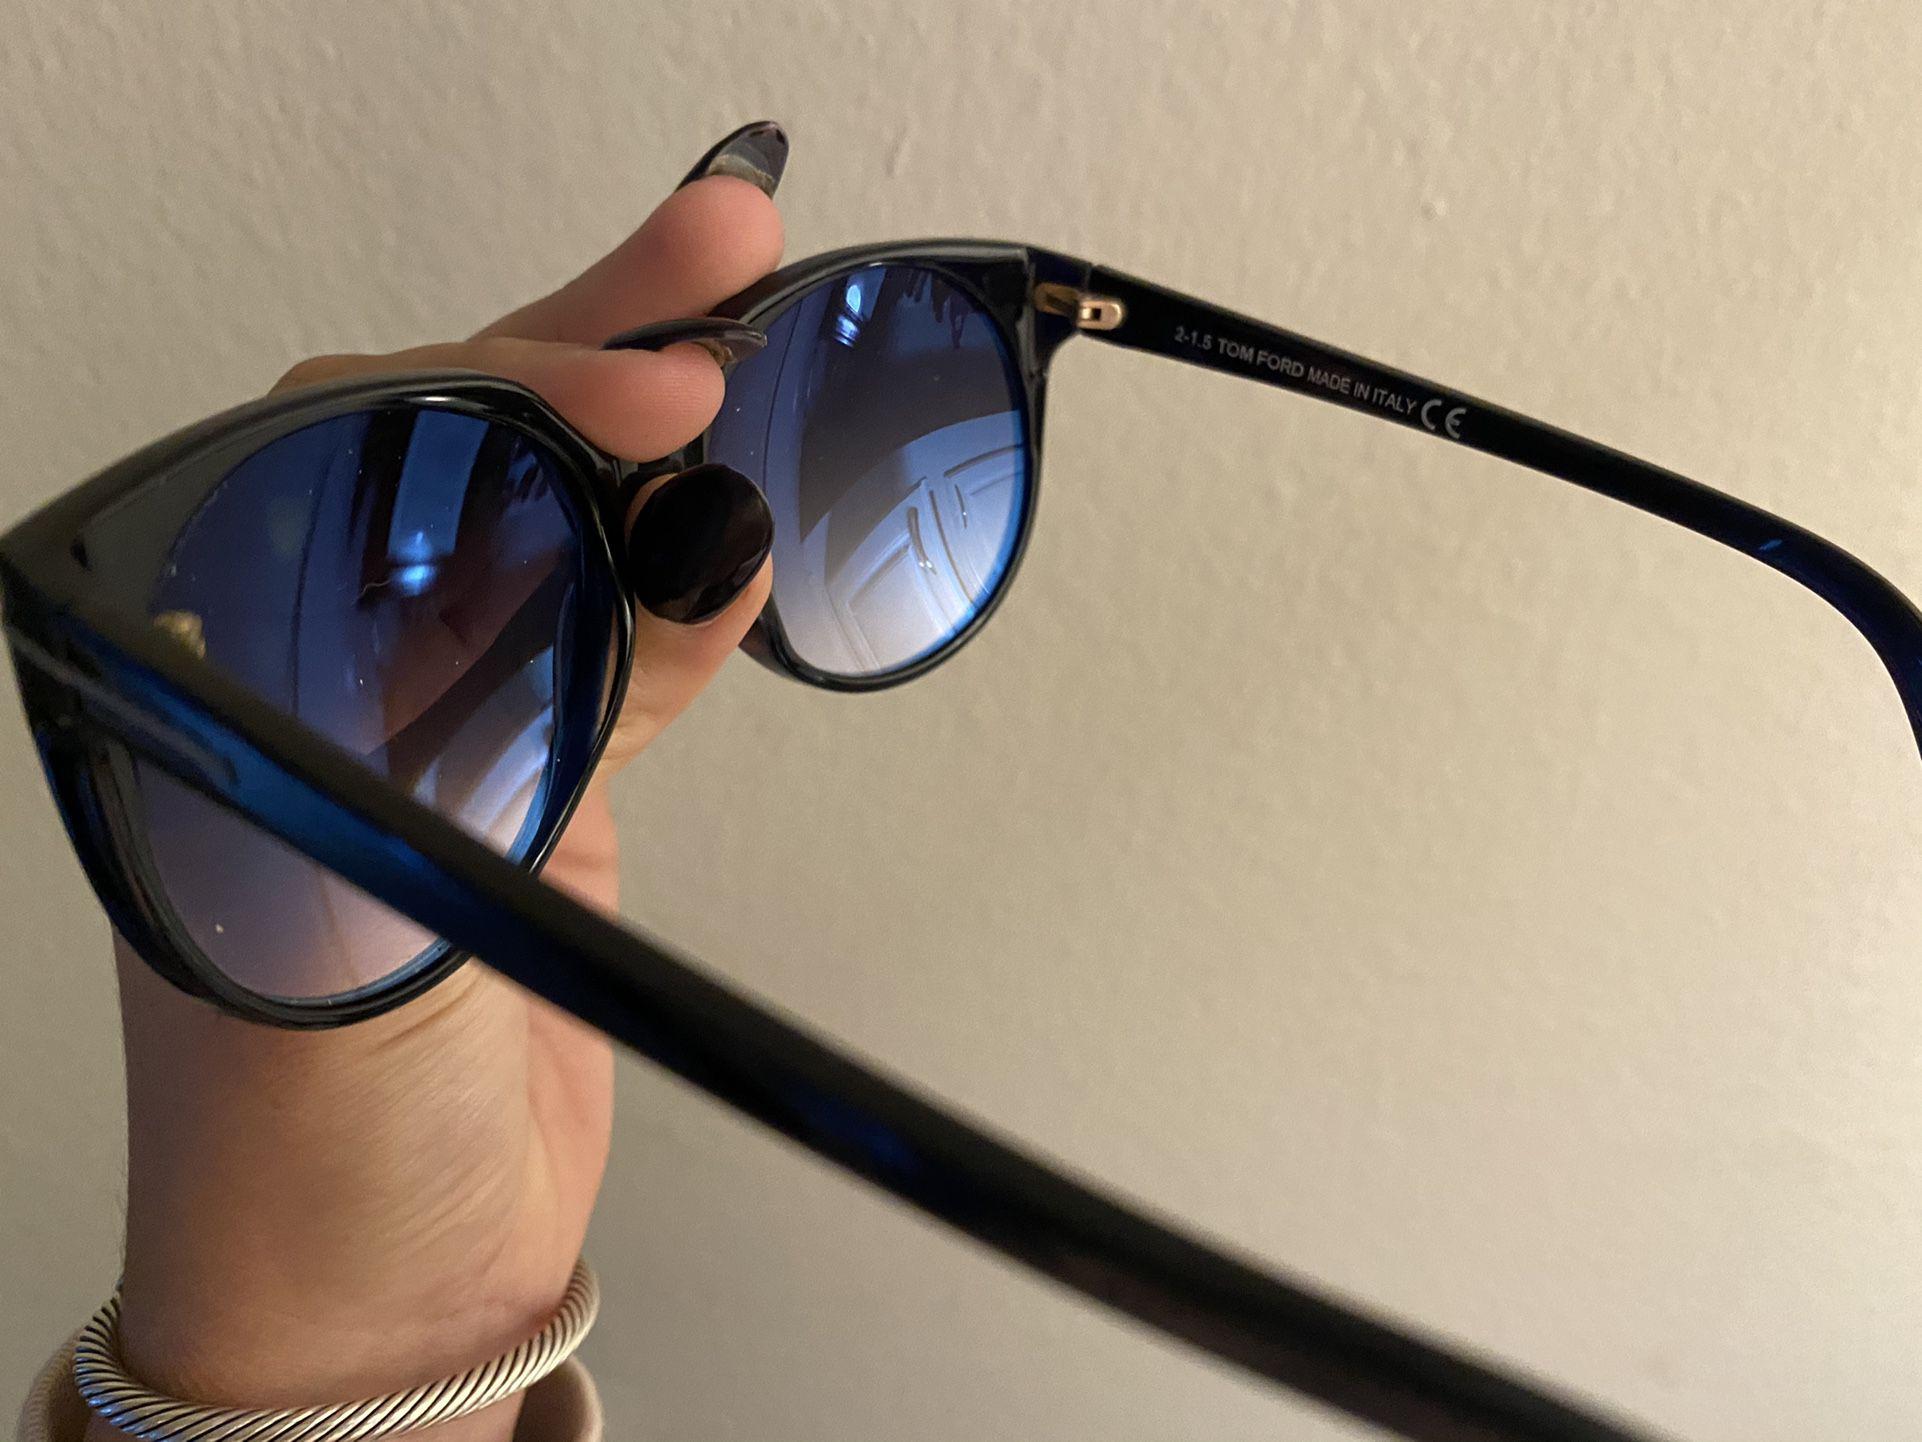 Tom Ford Polarized Sunglasses